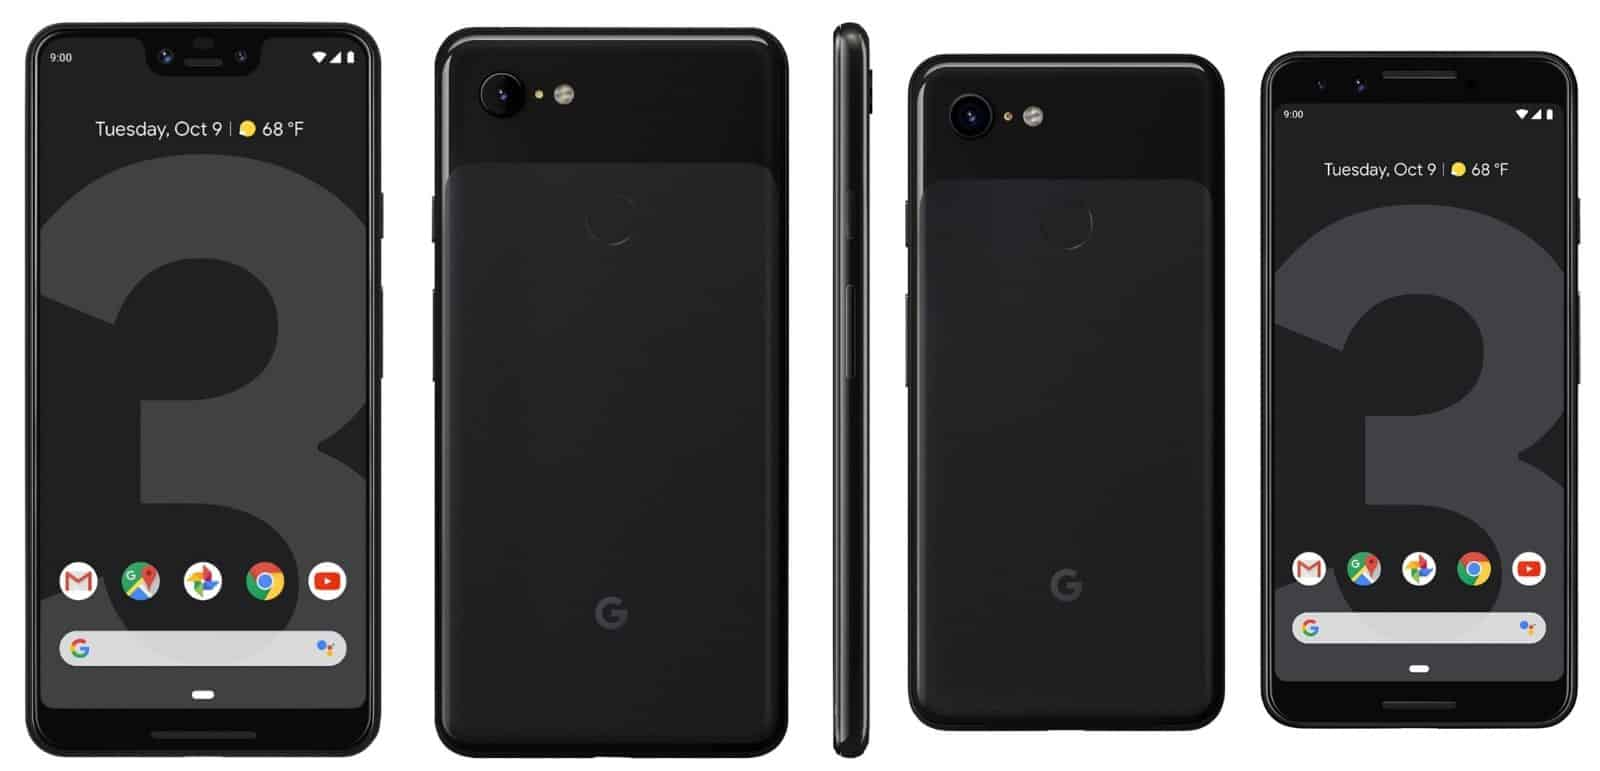 Google Pixel 3 and 3 XL possibly last leak 3